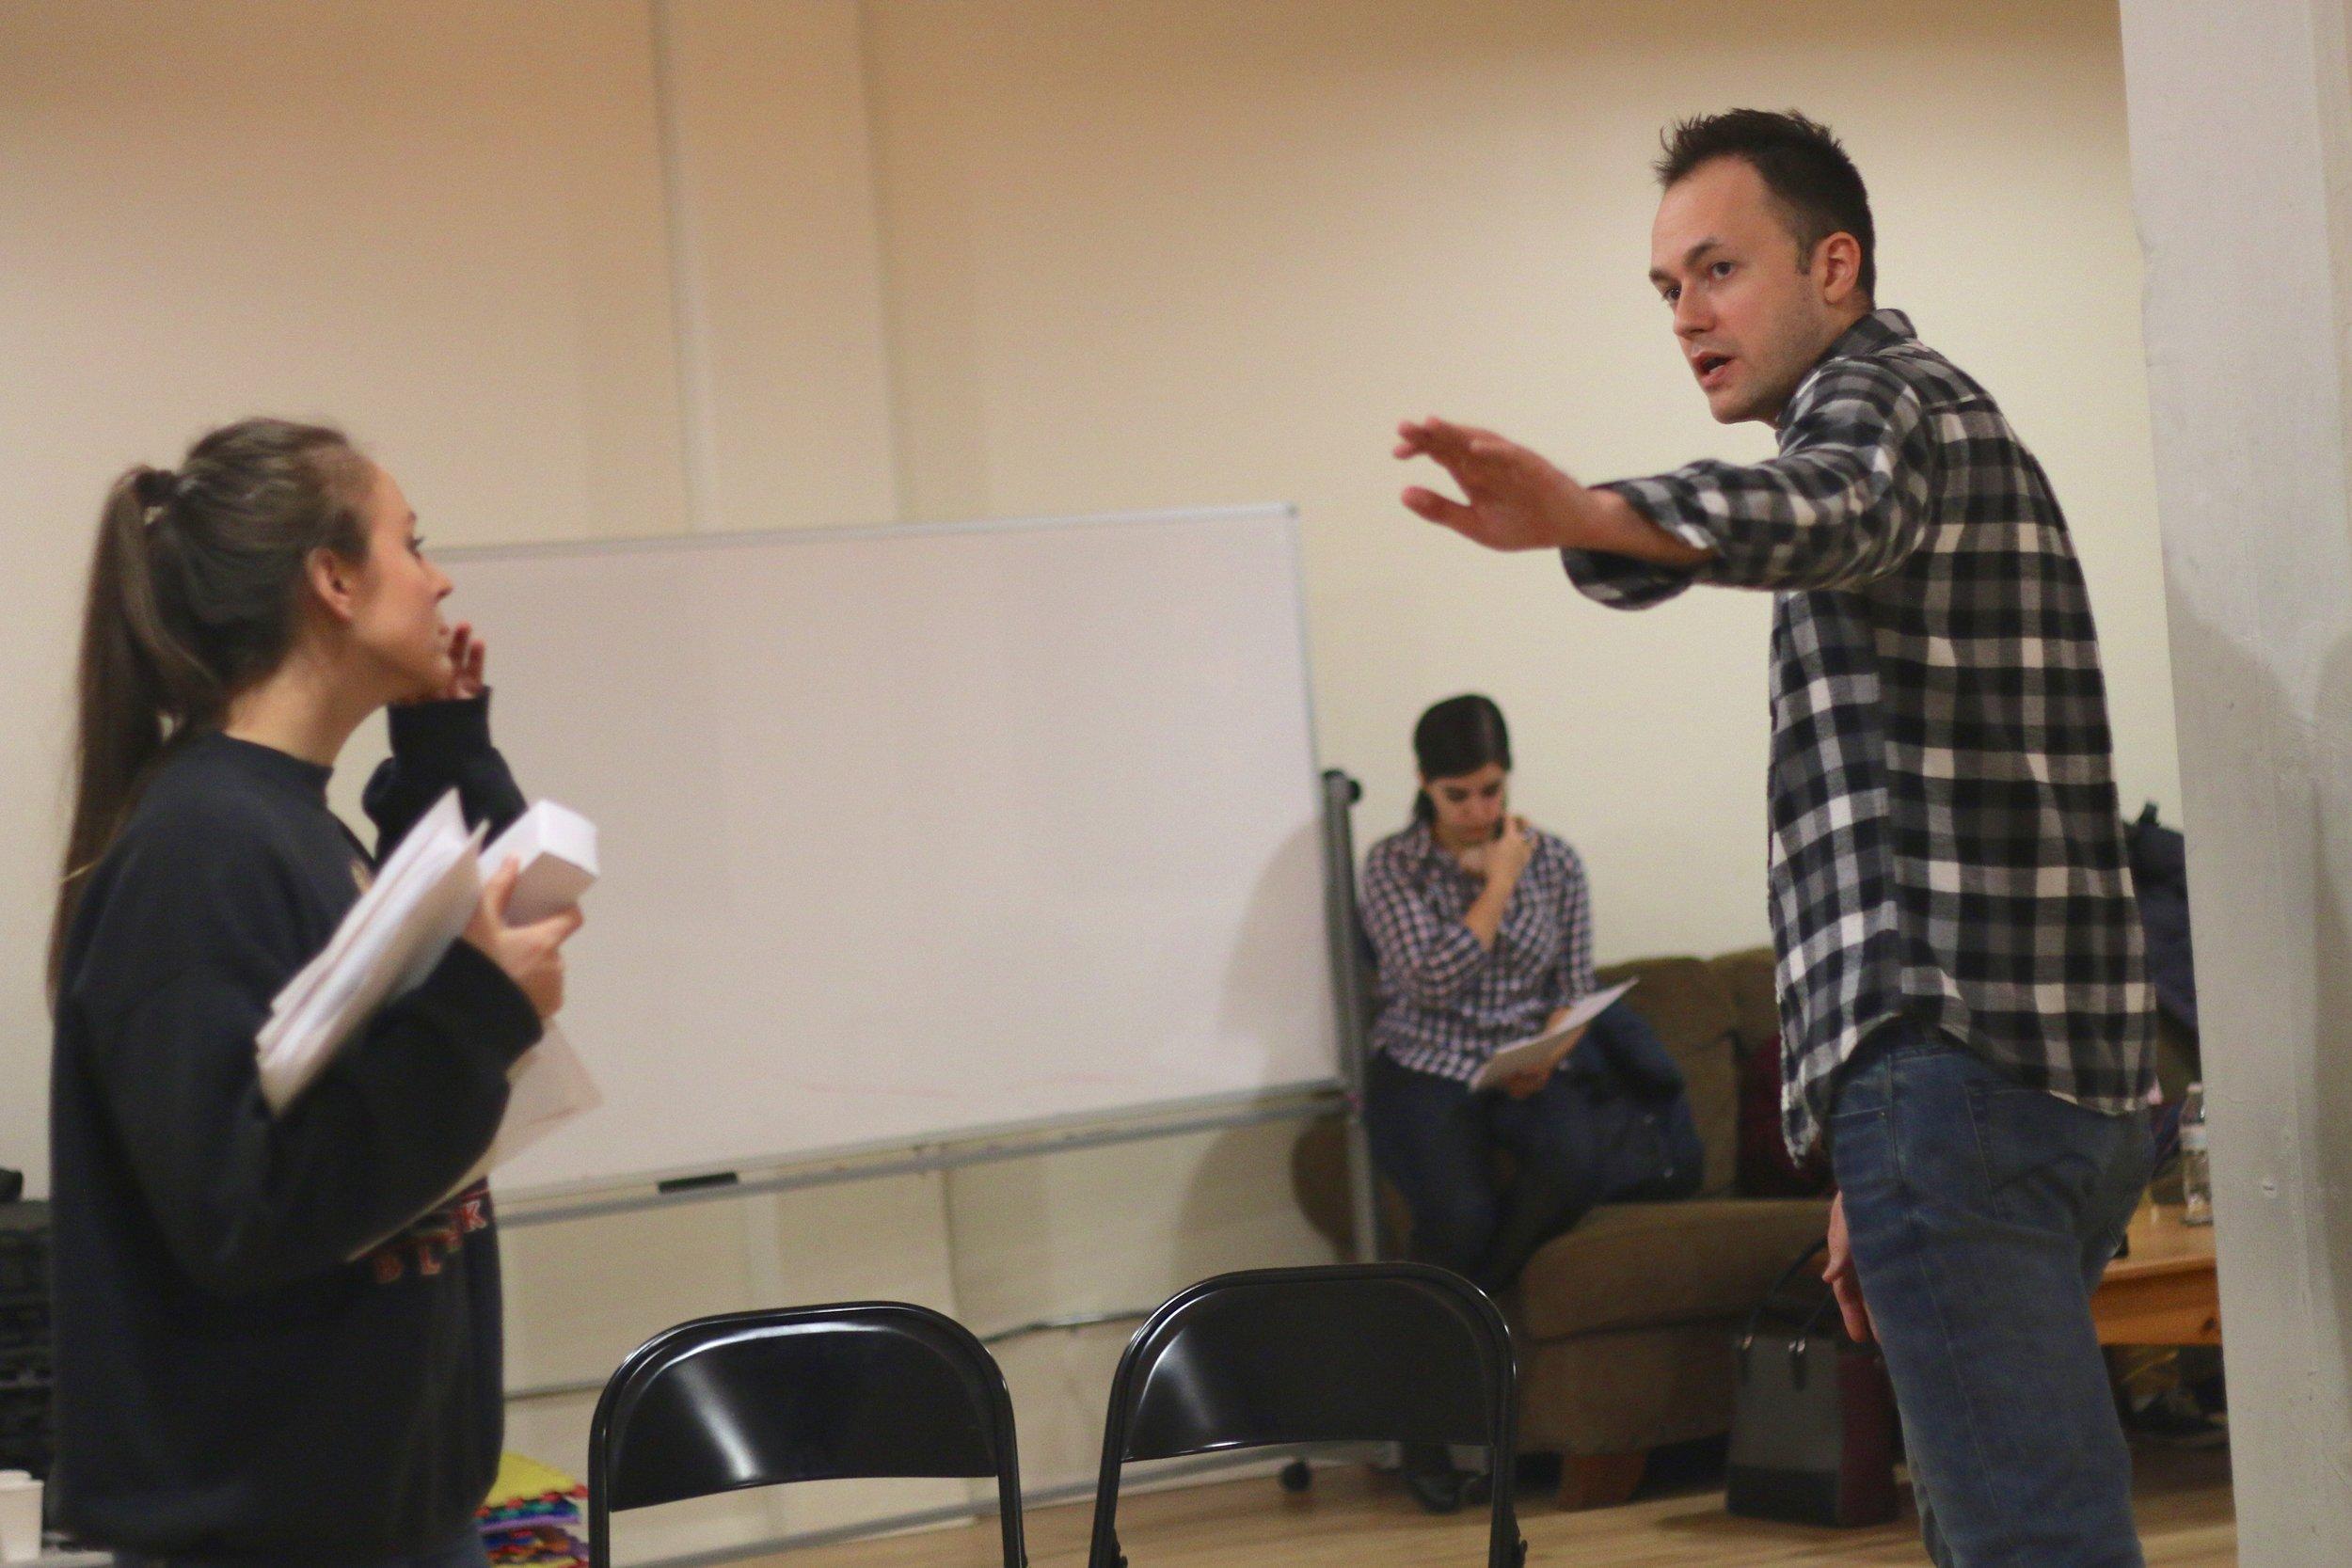 Jenna Liddle and Derek Bertelsen in rehearsal for  Mary-Kate Olsen Is In Love . Photo by Cody Jolly.